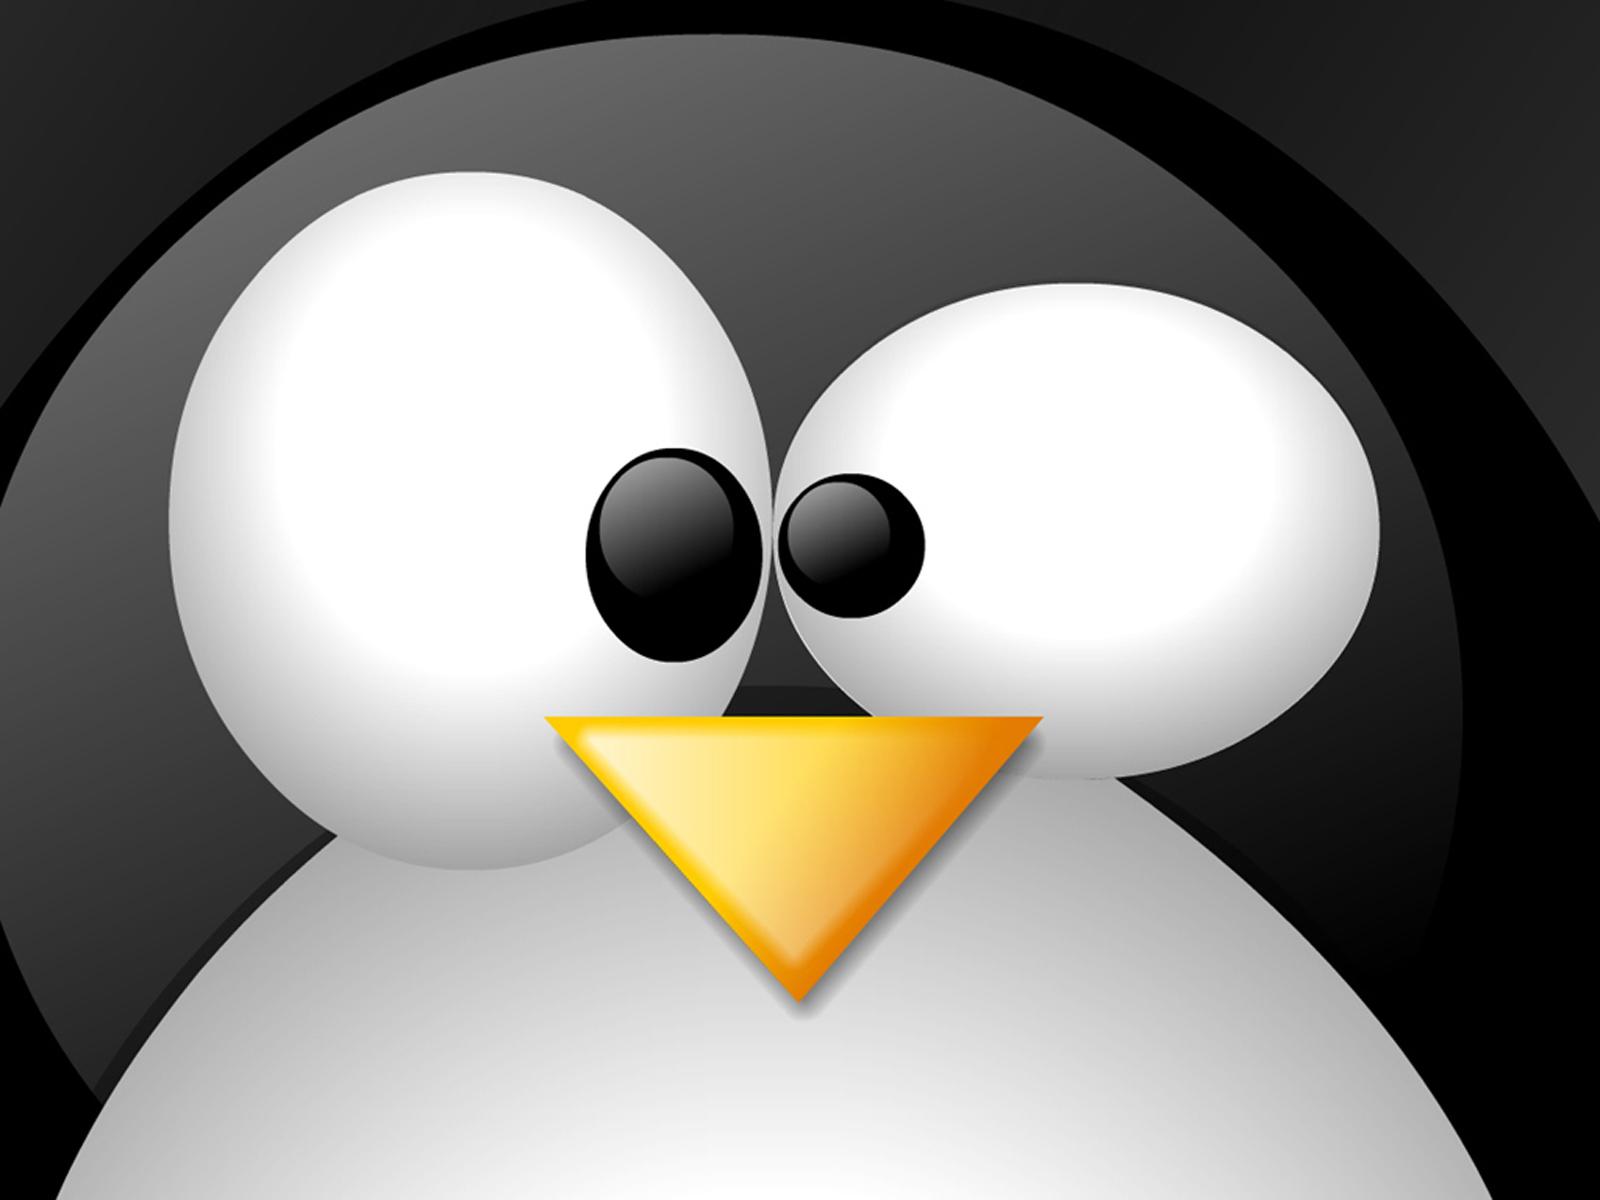 Download Linux Wallpapers Penguin Upclose Wallpaper Desktop HD